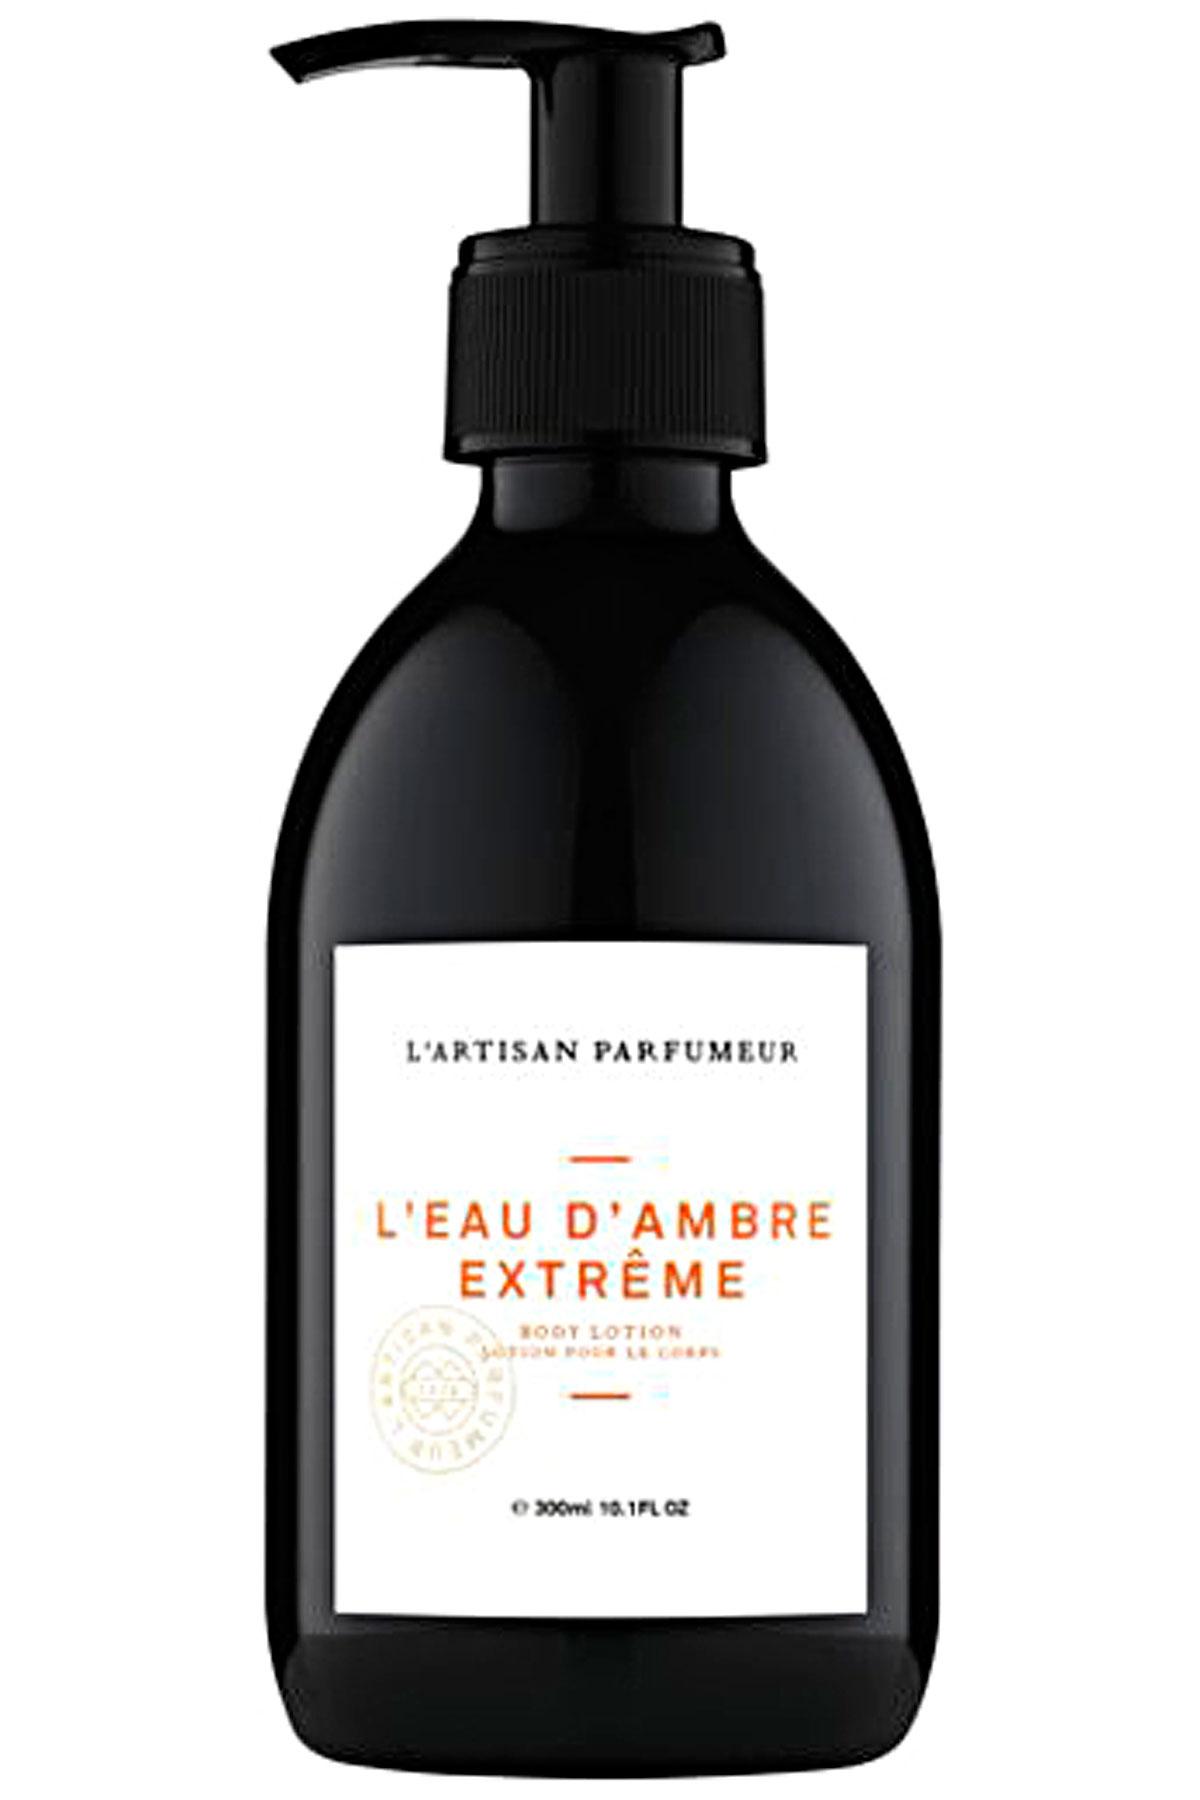 Artisan Parfumeur Beauty for Women On Sale, L Eau D Ambre Extreme - Body Lotion - 300 Ml, 2019, 300 ml